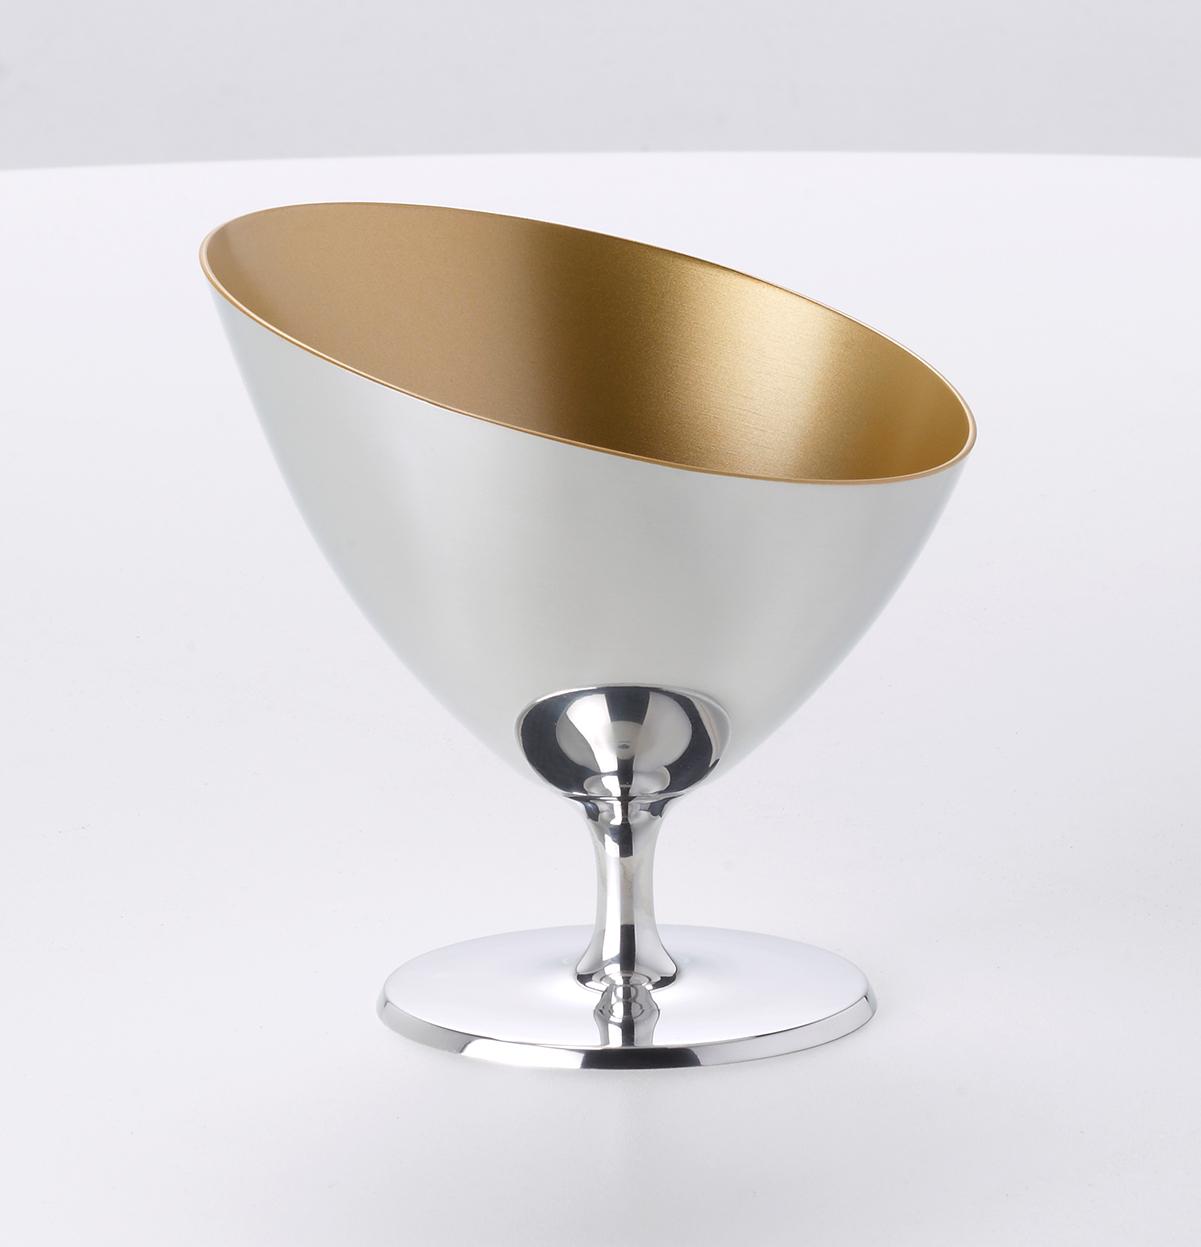 OA1710-seau-à-champagne-design-produit-agence-planet-design-eric-berthes04.jpg